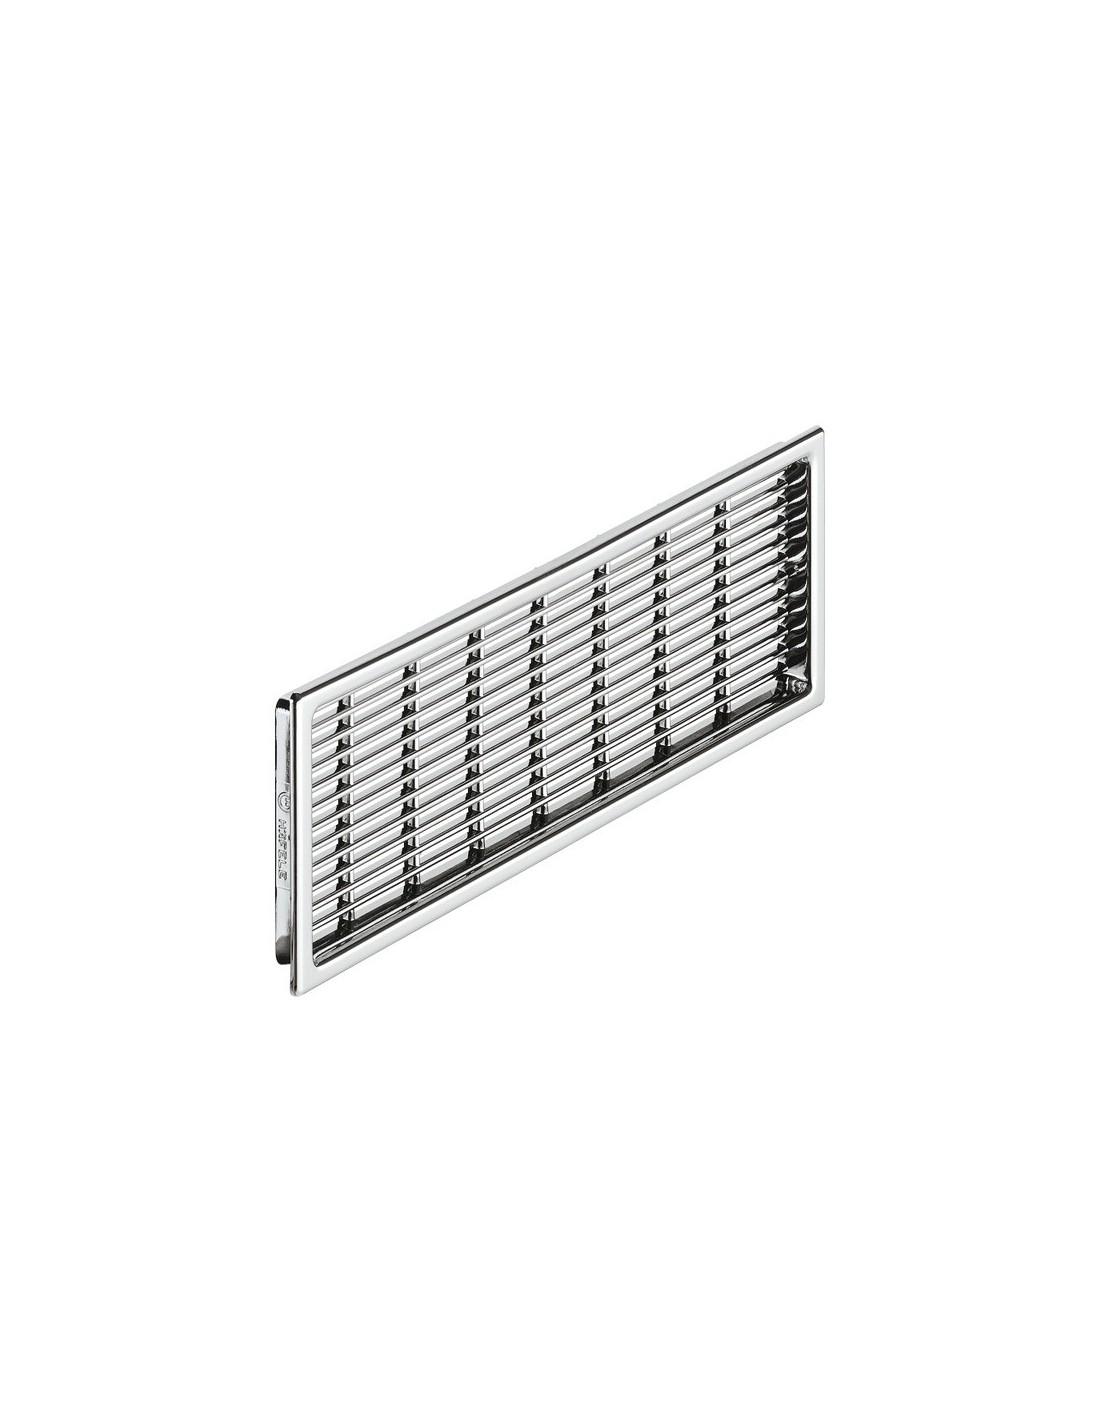 Solid Round Spiro Ducting - All Round HVAC